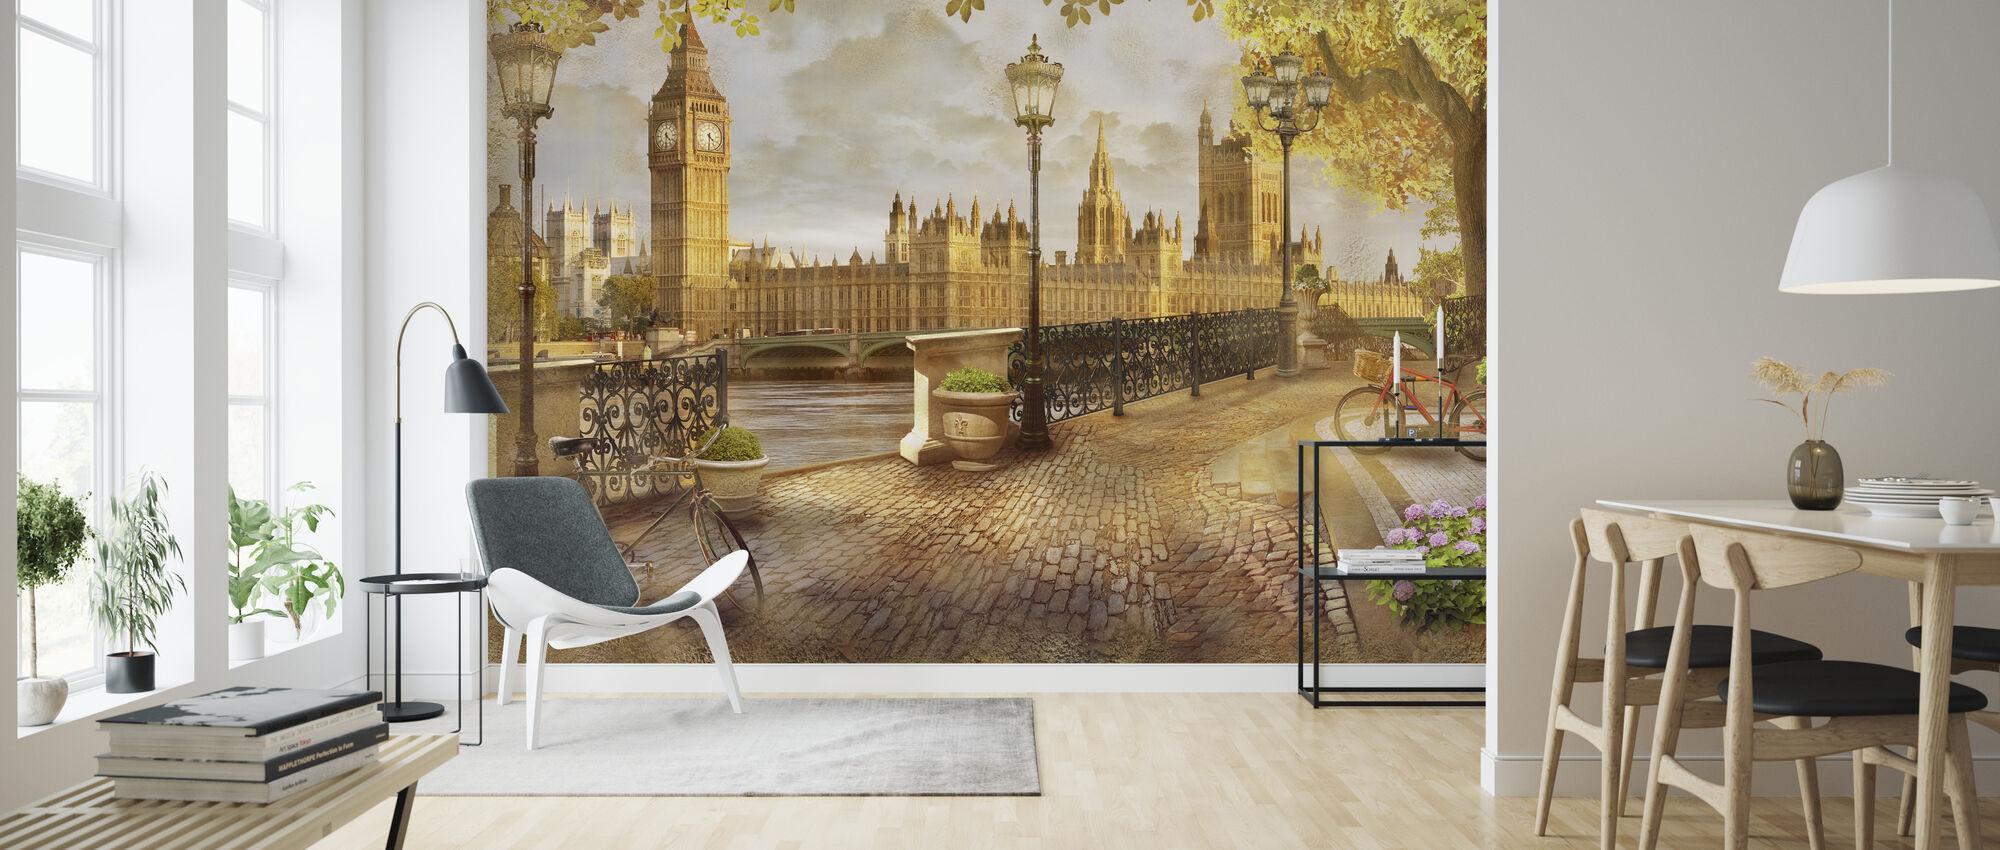 London Big Ben View - Wallpaper - Living Room